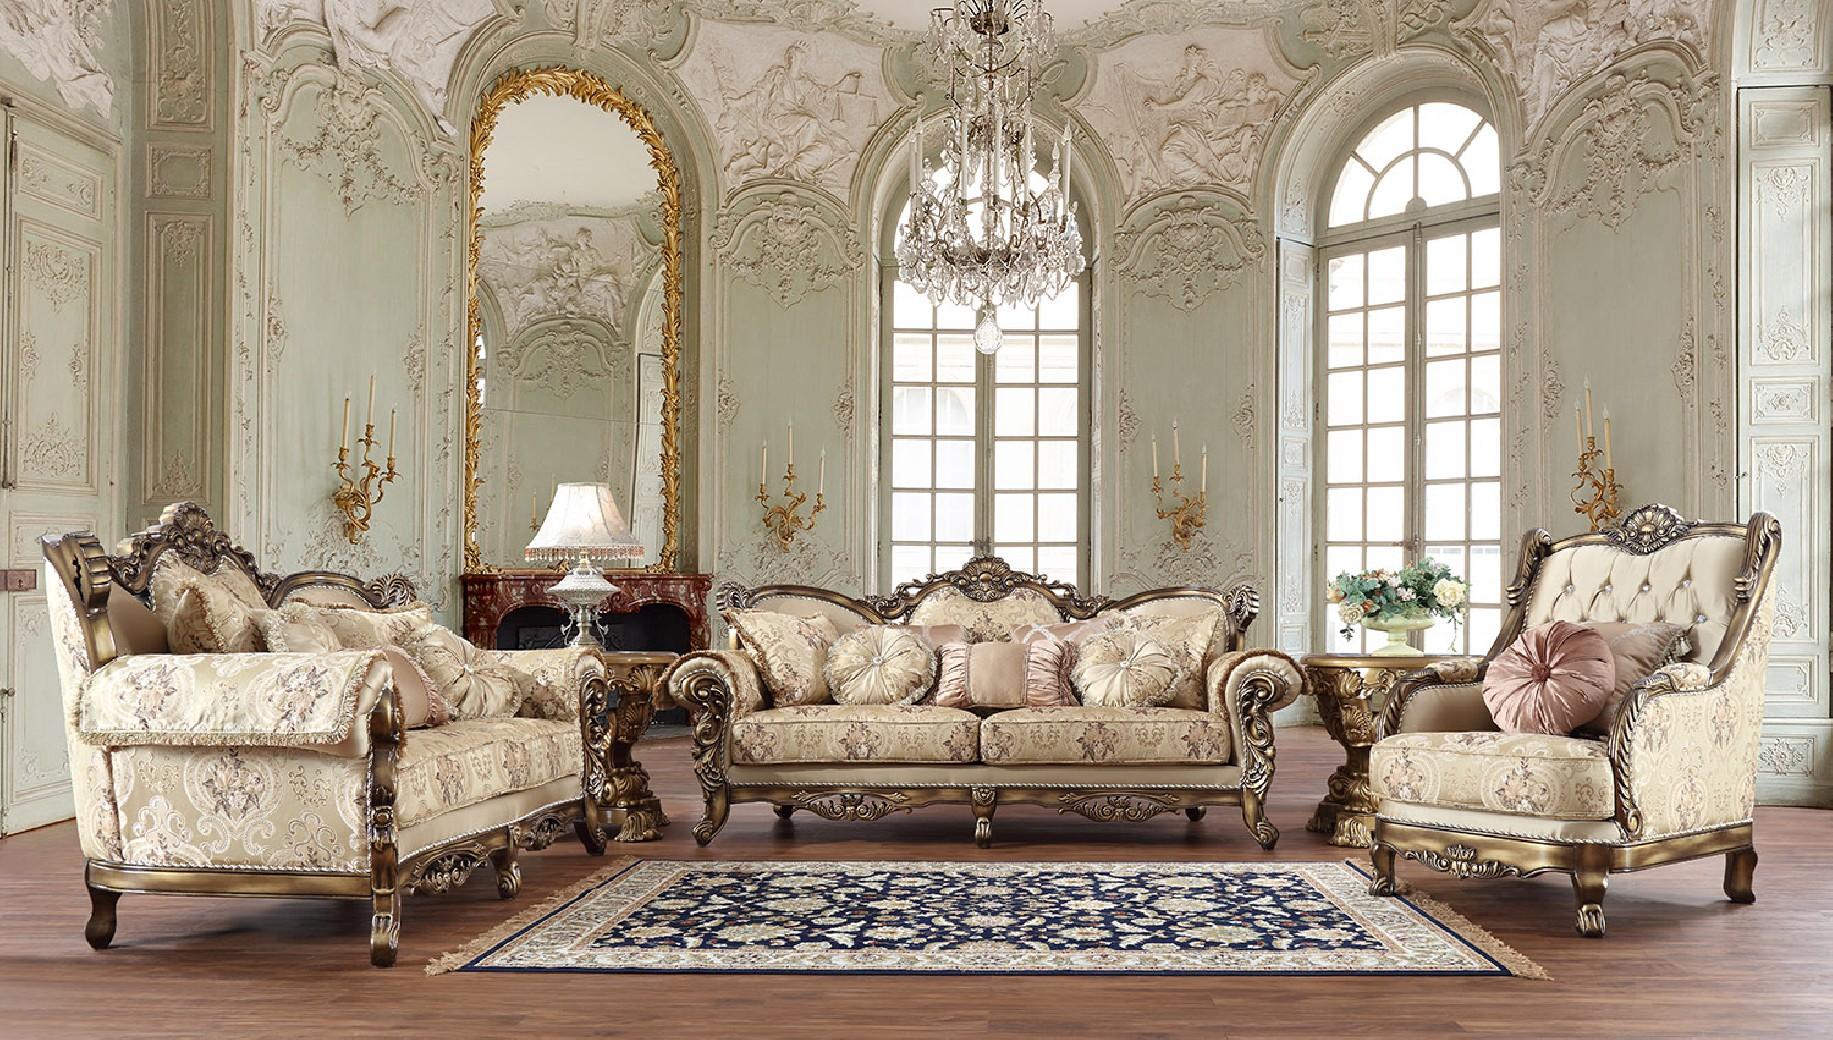 HD 506 Homey Design Upholstery Living Room Set Victorian ...